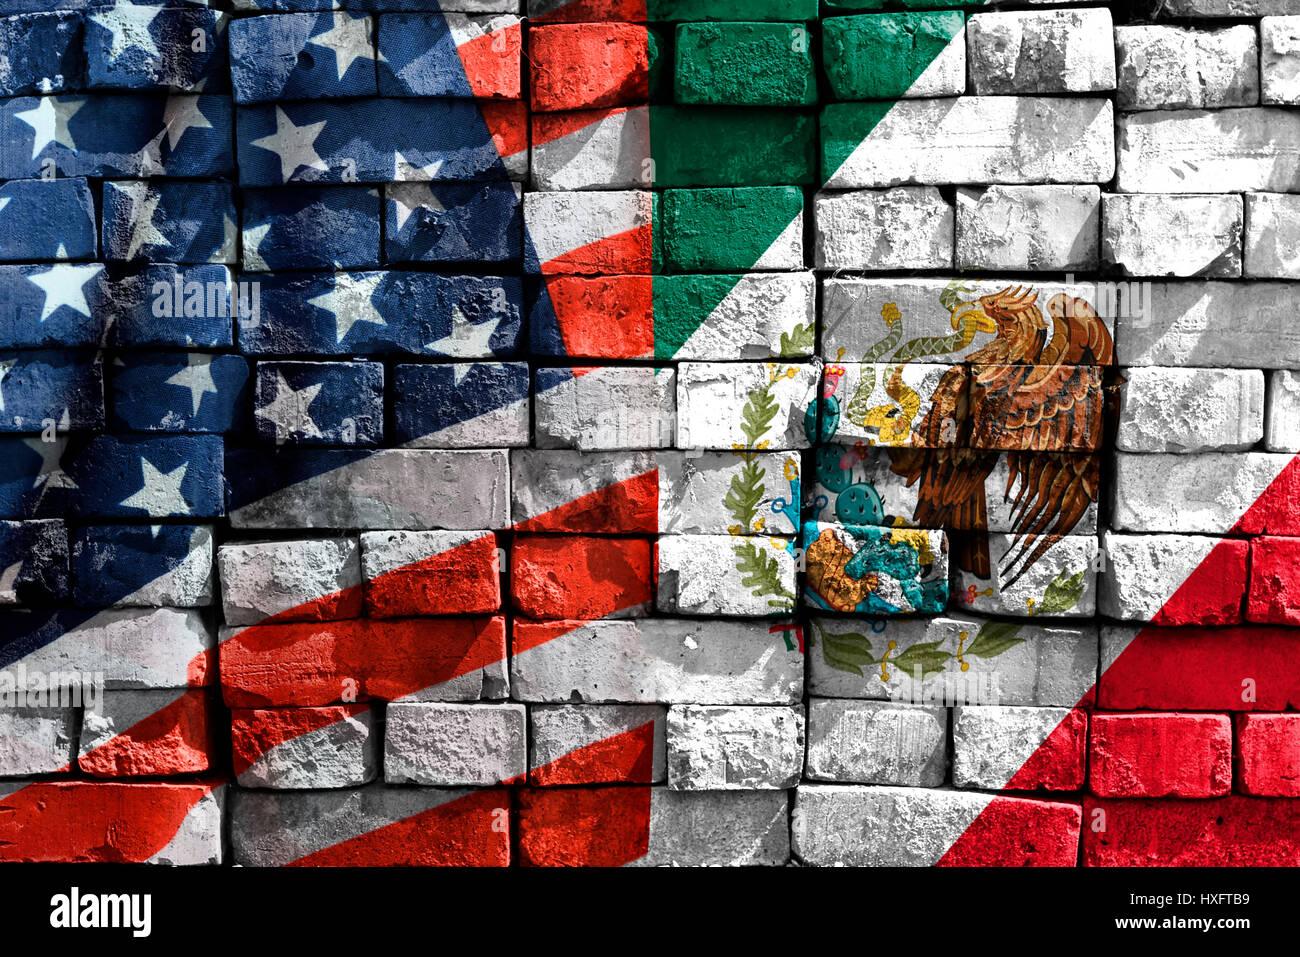 Flags of the USA and Mexico on a wall, Fahnen von den USA und Mexiko auf einer Mauer - Stock Image